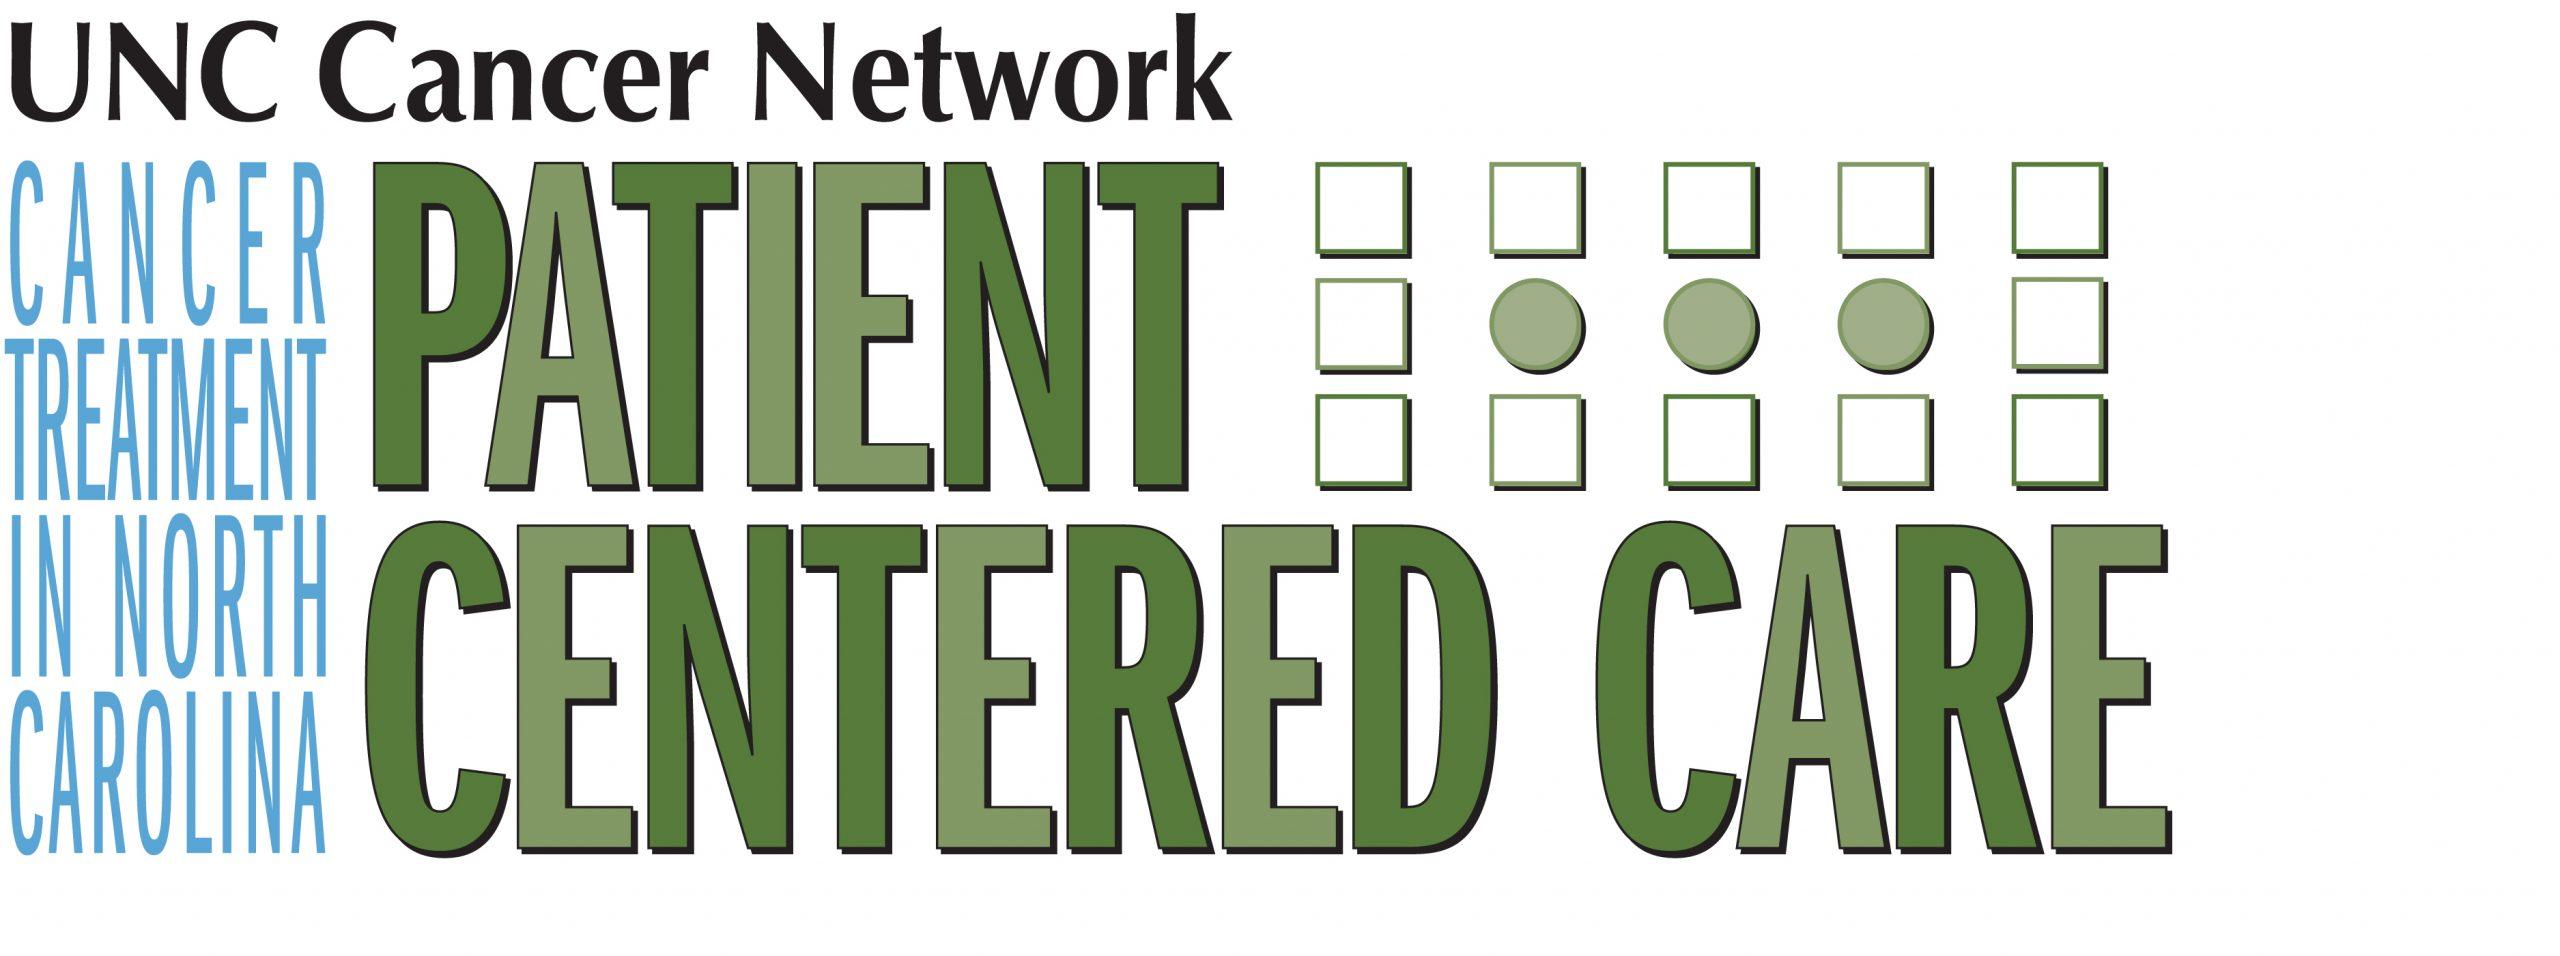 Patient Centered Care Logo